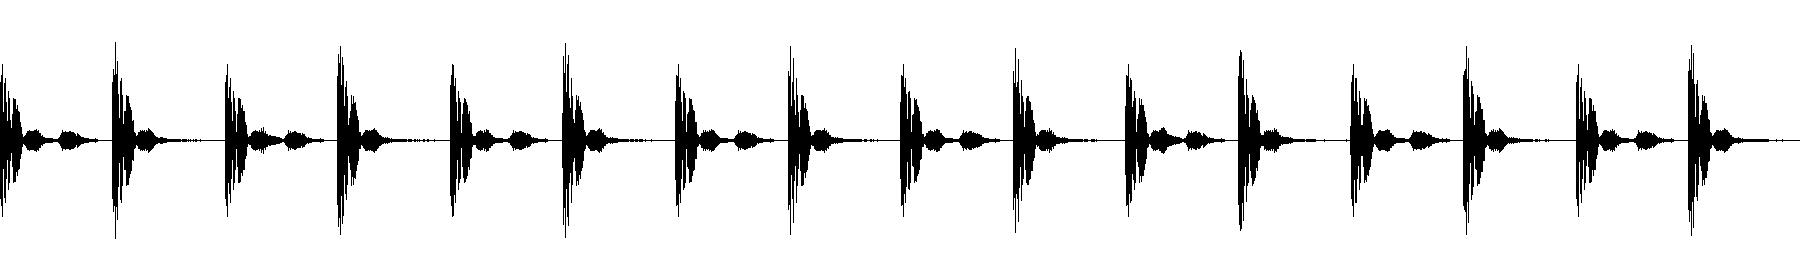 104 drums 01 sp